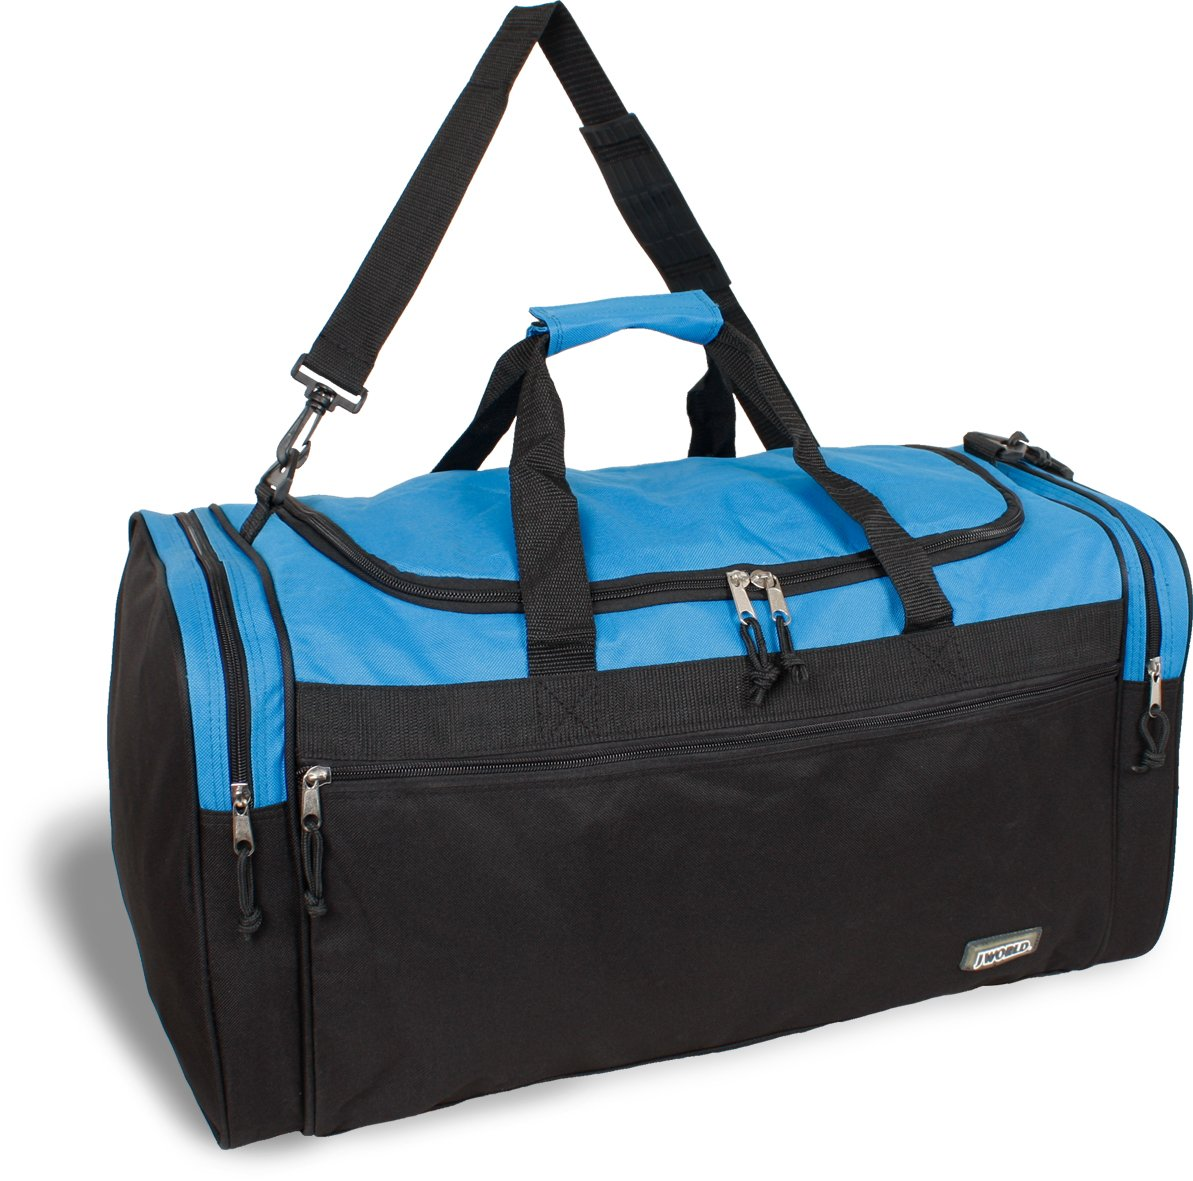 J World New York Copper 18 Inch Duffel Bag, Blue, One Size